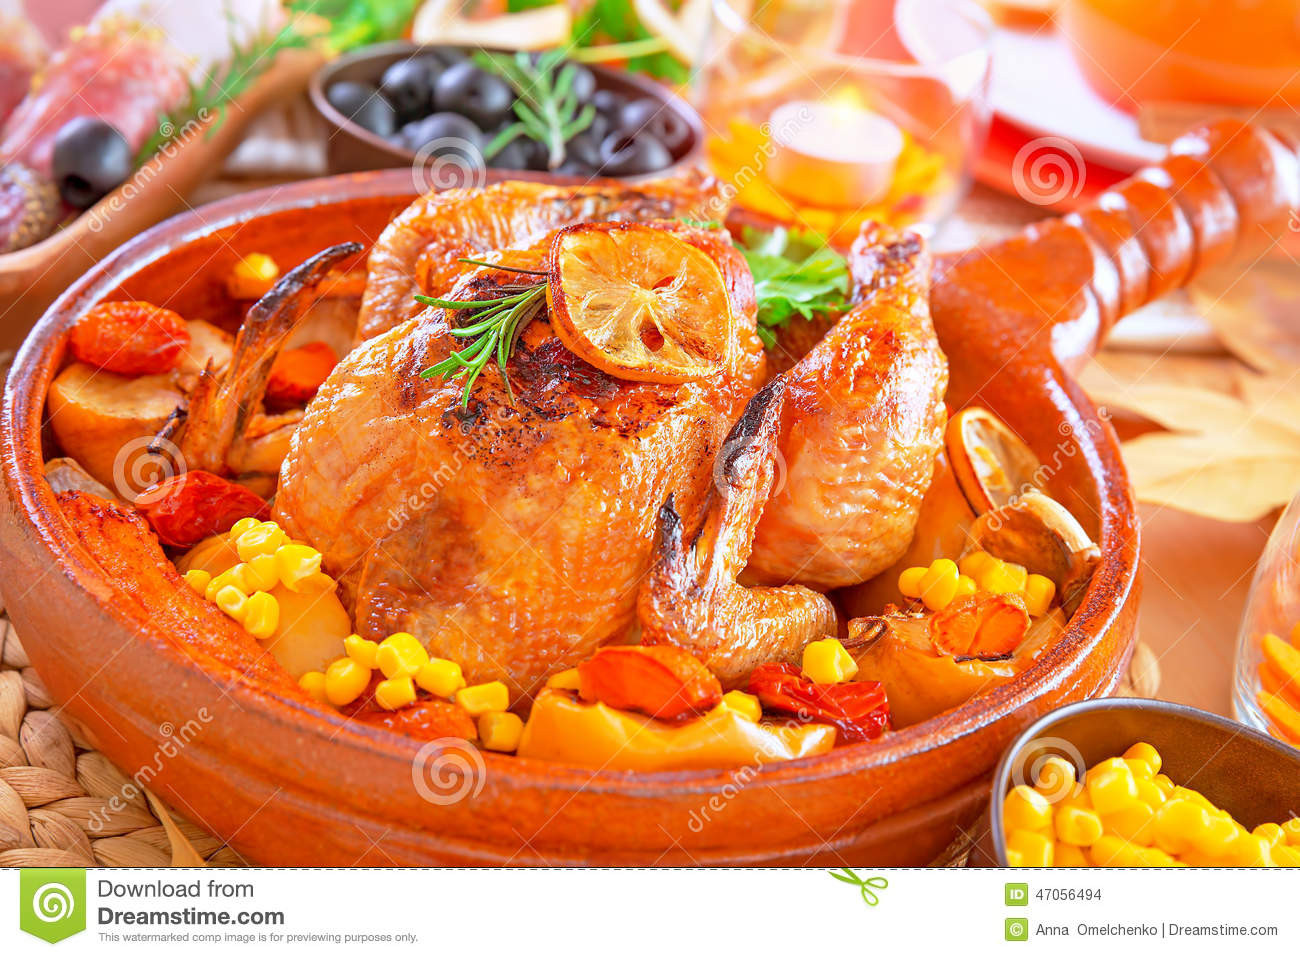 Prepared Thanksgiving Turkey  Delicious Prepared Thanksgiving Turkey Stock Image